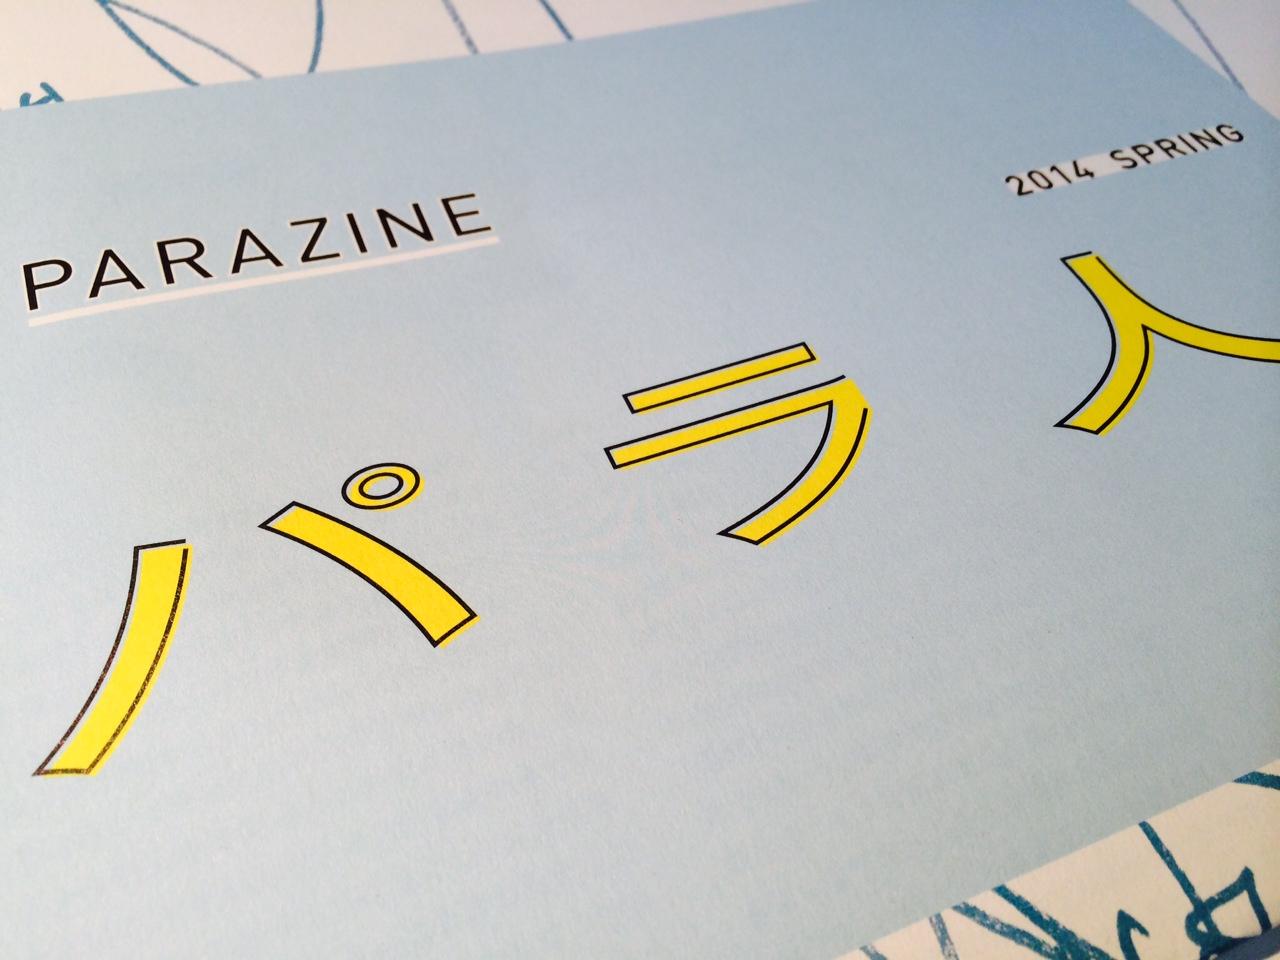 parazine1-2.jpg